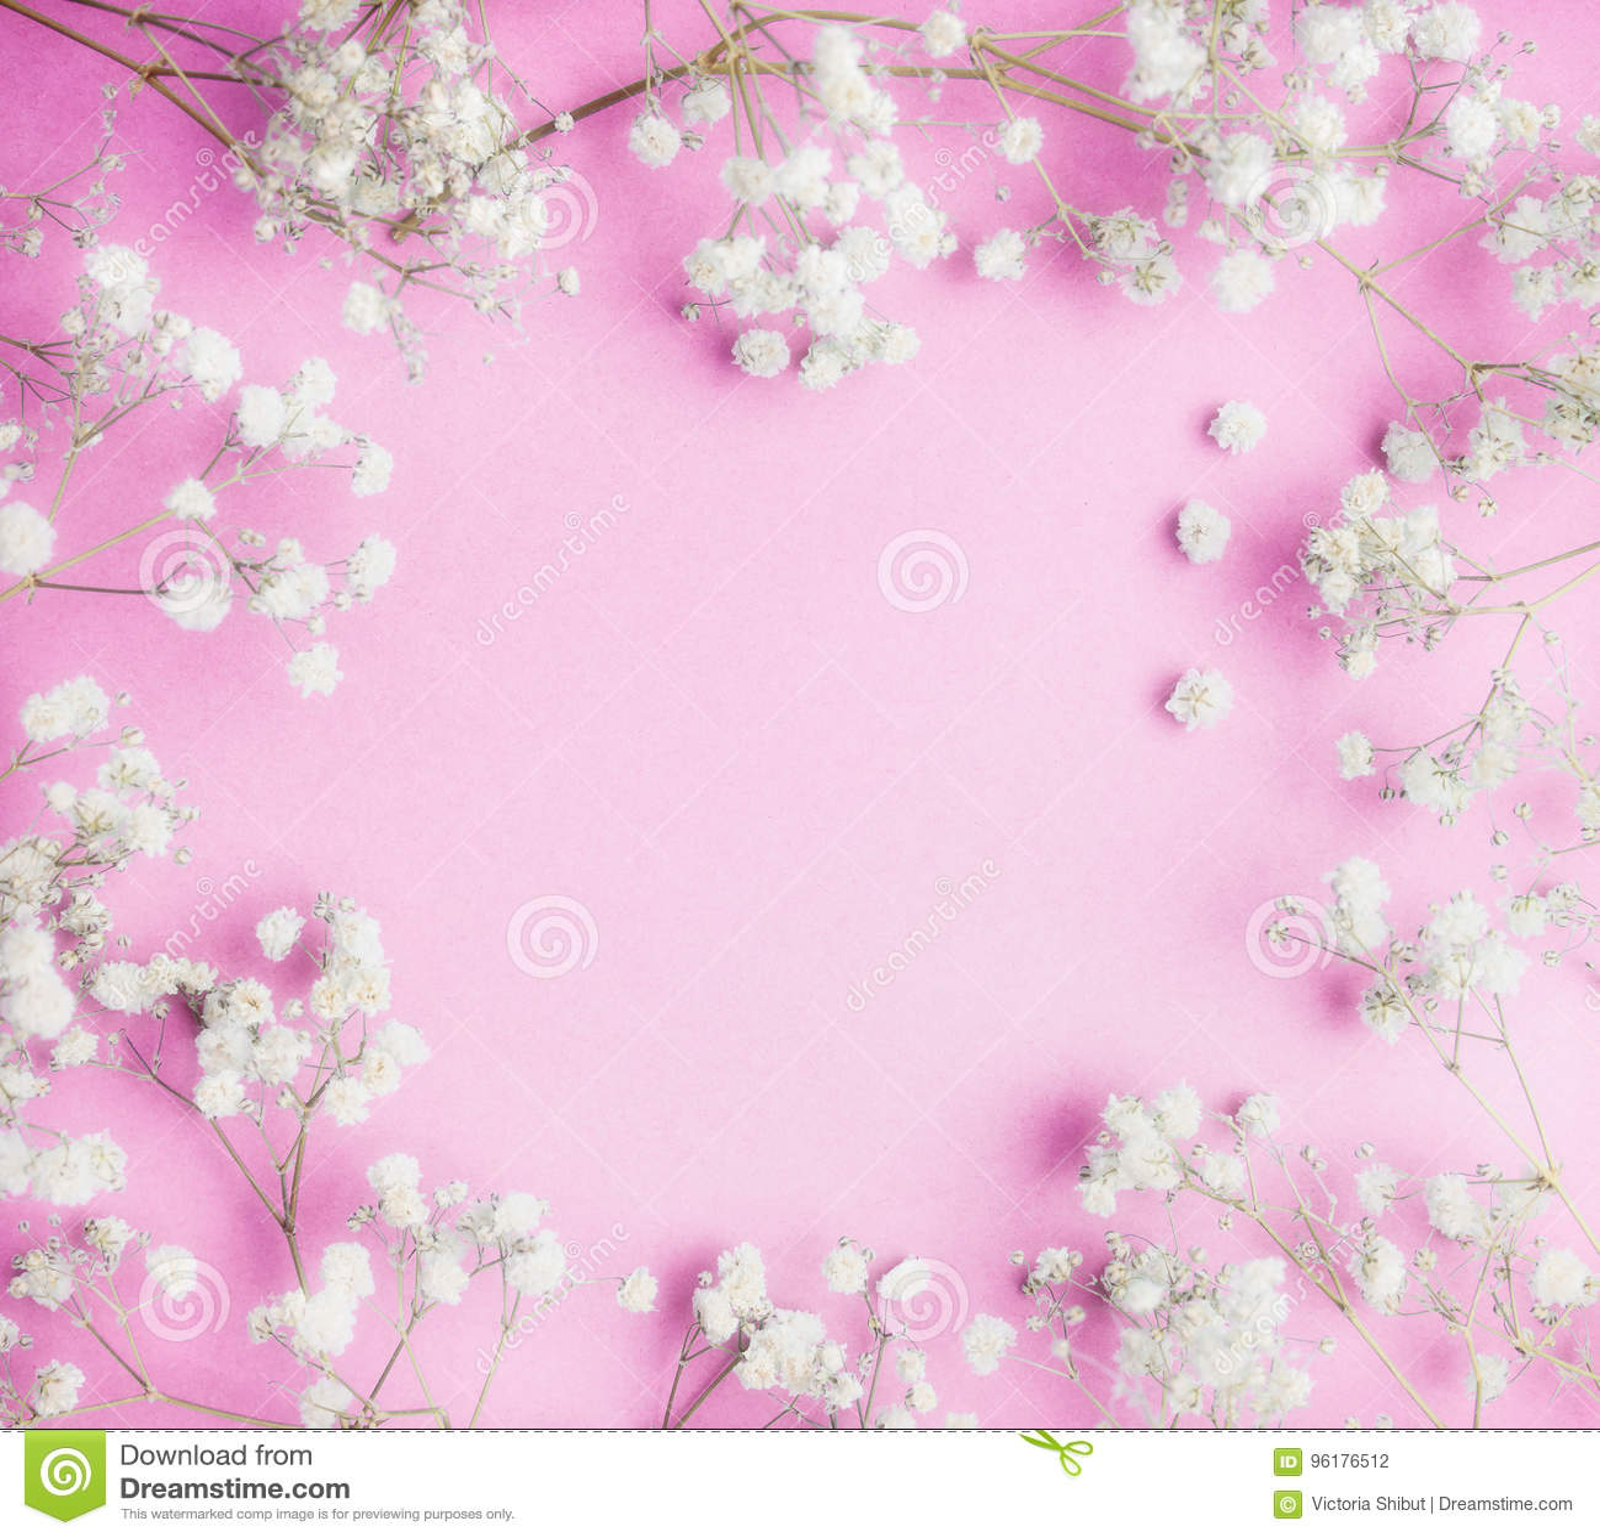 Lovely Little White Gypsophila Flowers On Pink Background Pretty